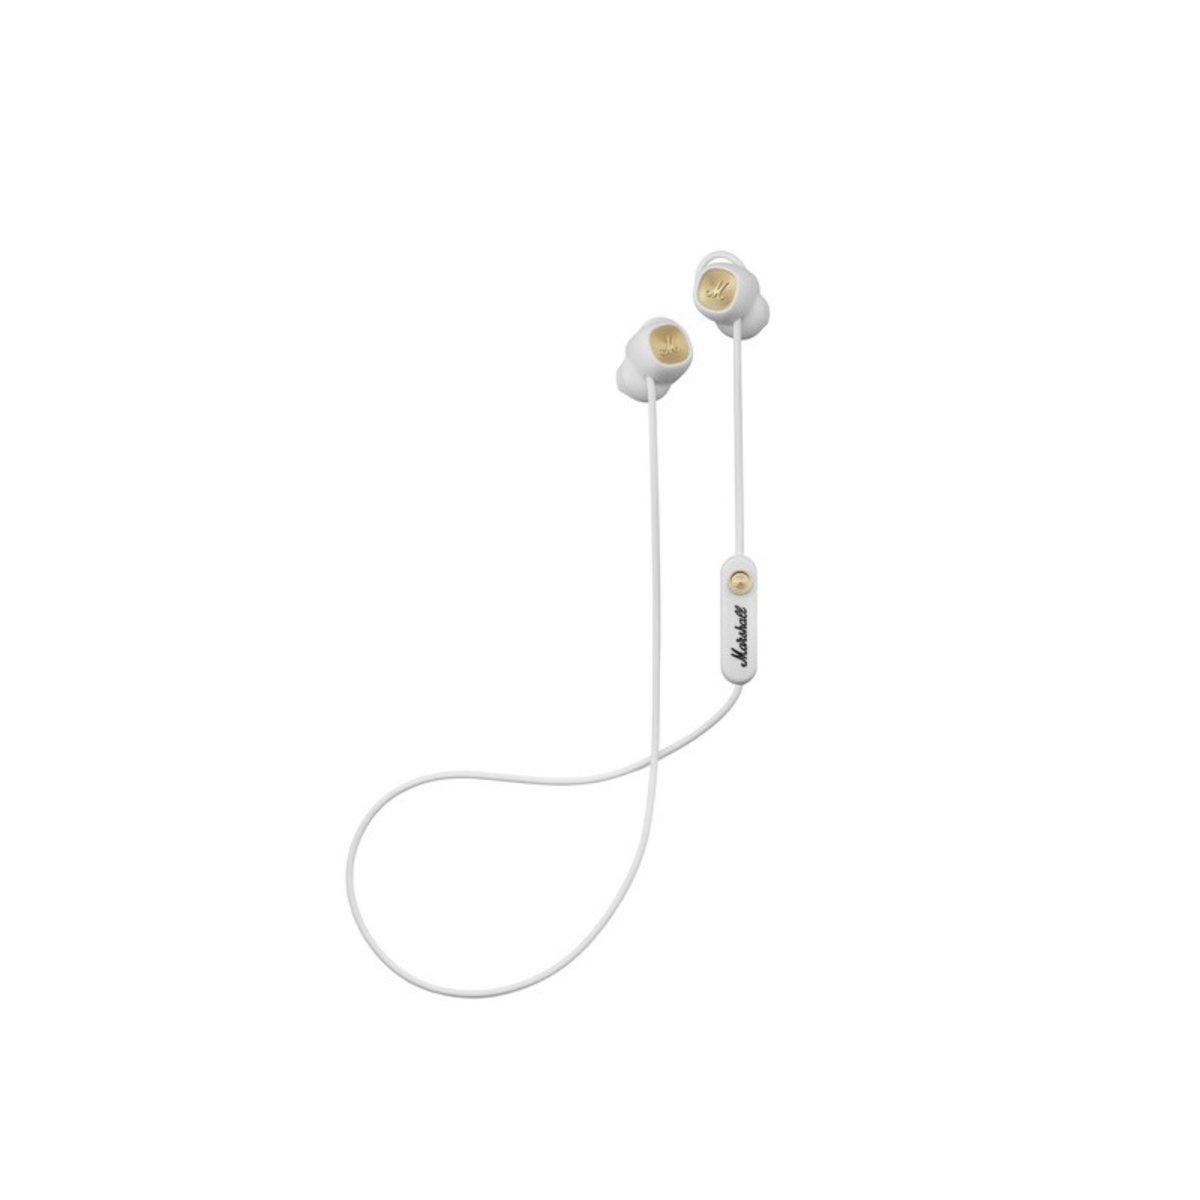 MINOR II BLUETOOTH IN-EAR EARPHONE - WHITE ( MHP-92261 )